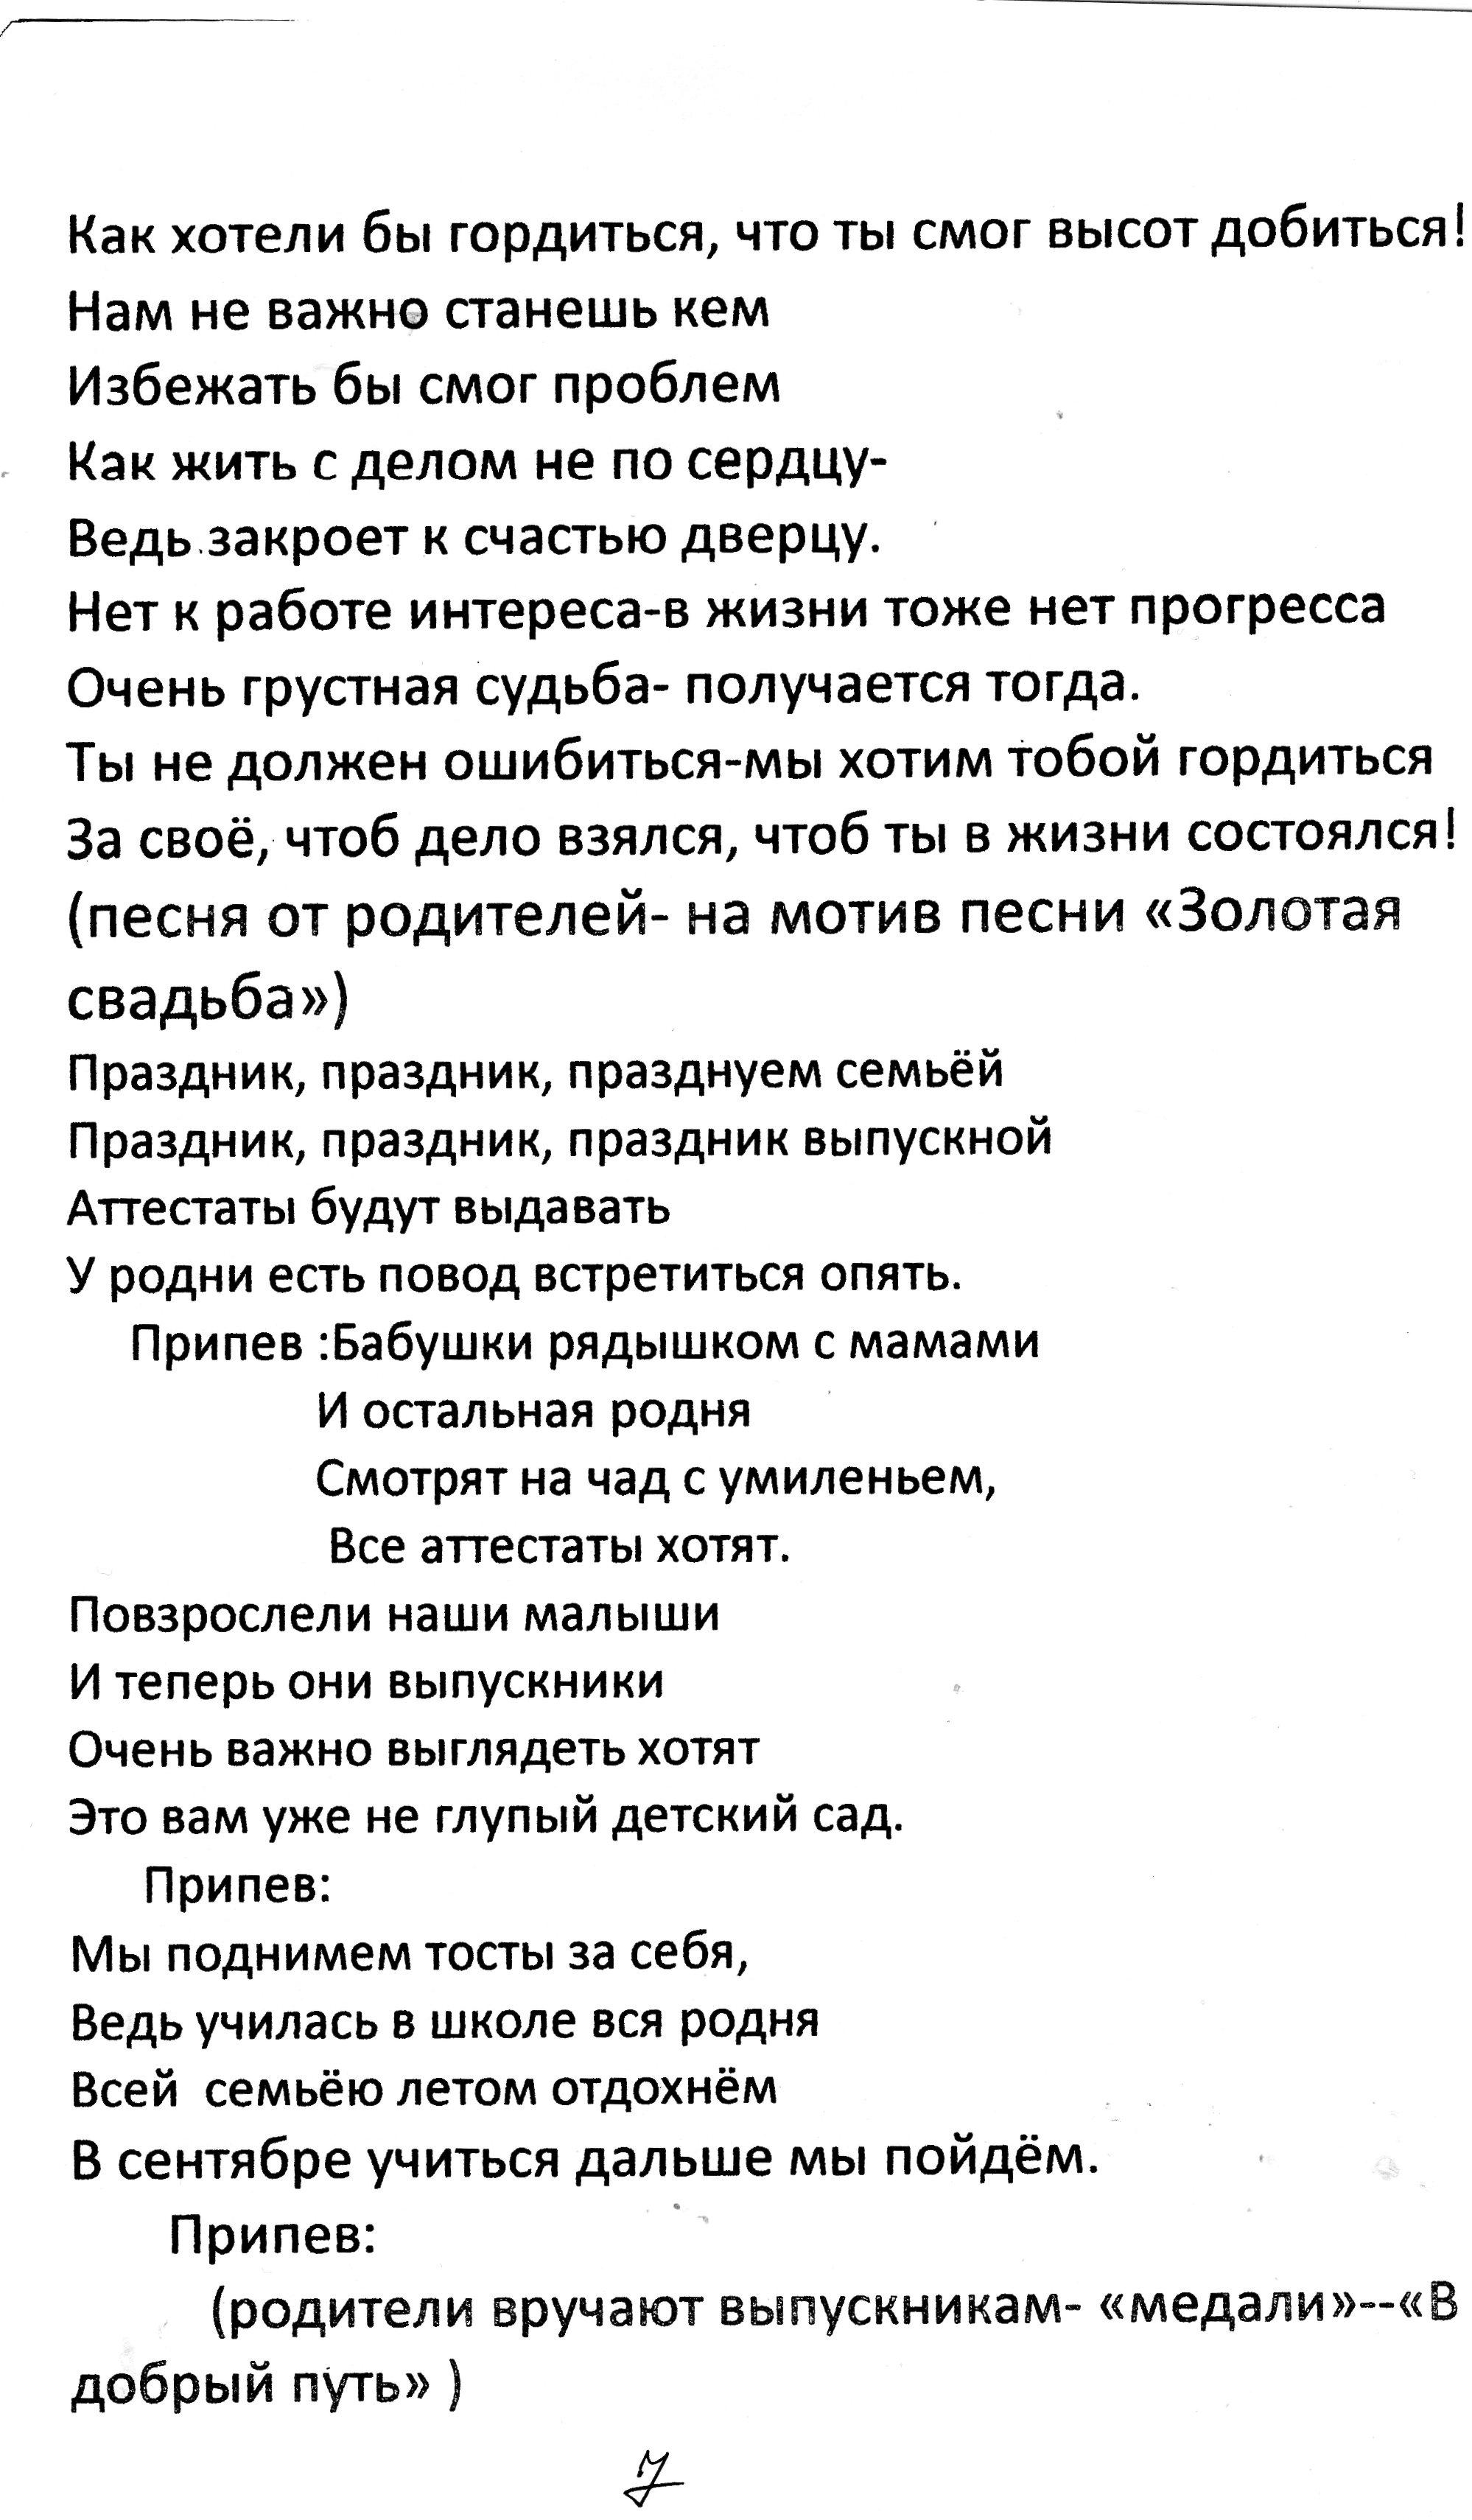 C:\Documents and Settings\ADMIN\Мои документы\9 кл выпускной\img013.jpg